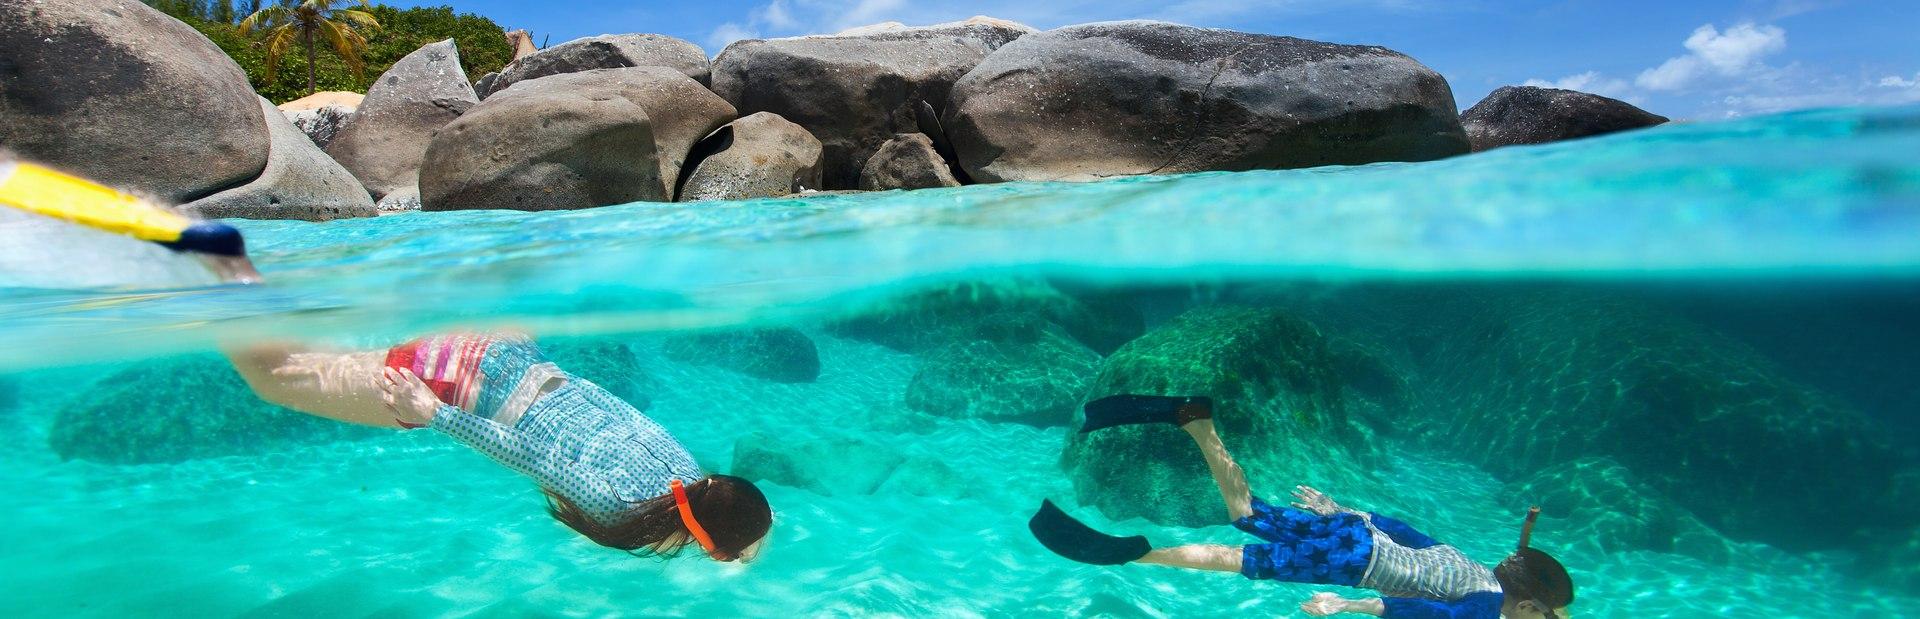 British Virgin Islands inspiration and tips